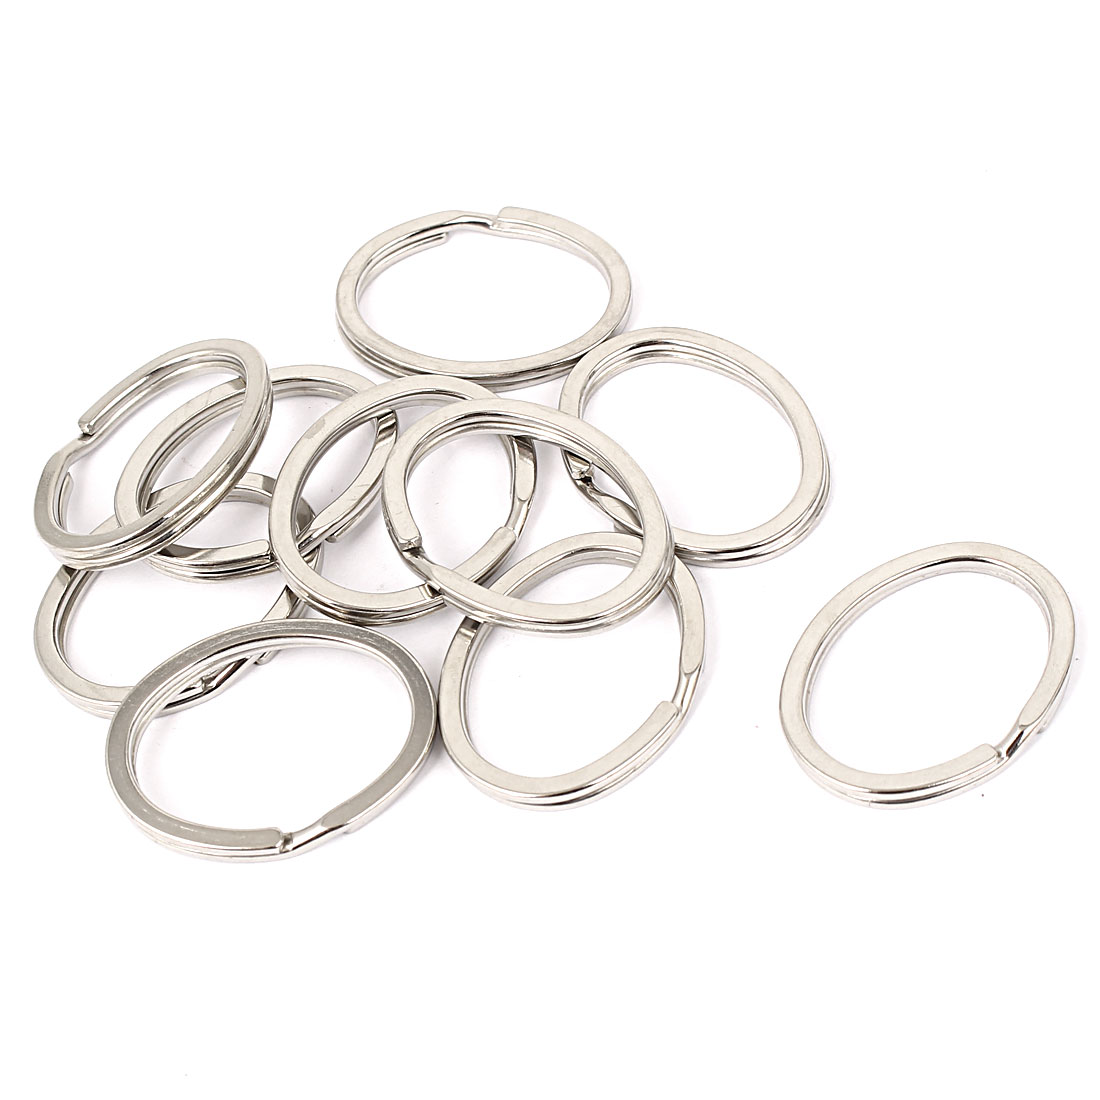 Metal DIY Craft Making Oval Shape Split Ring Key Ring Charms Silver Tone 10pcs